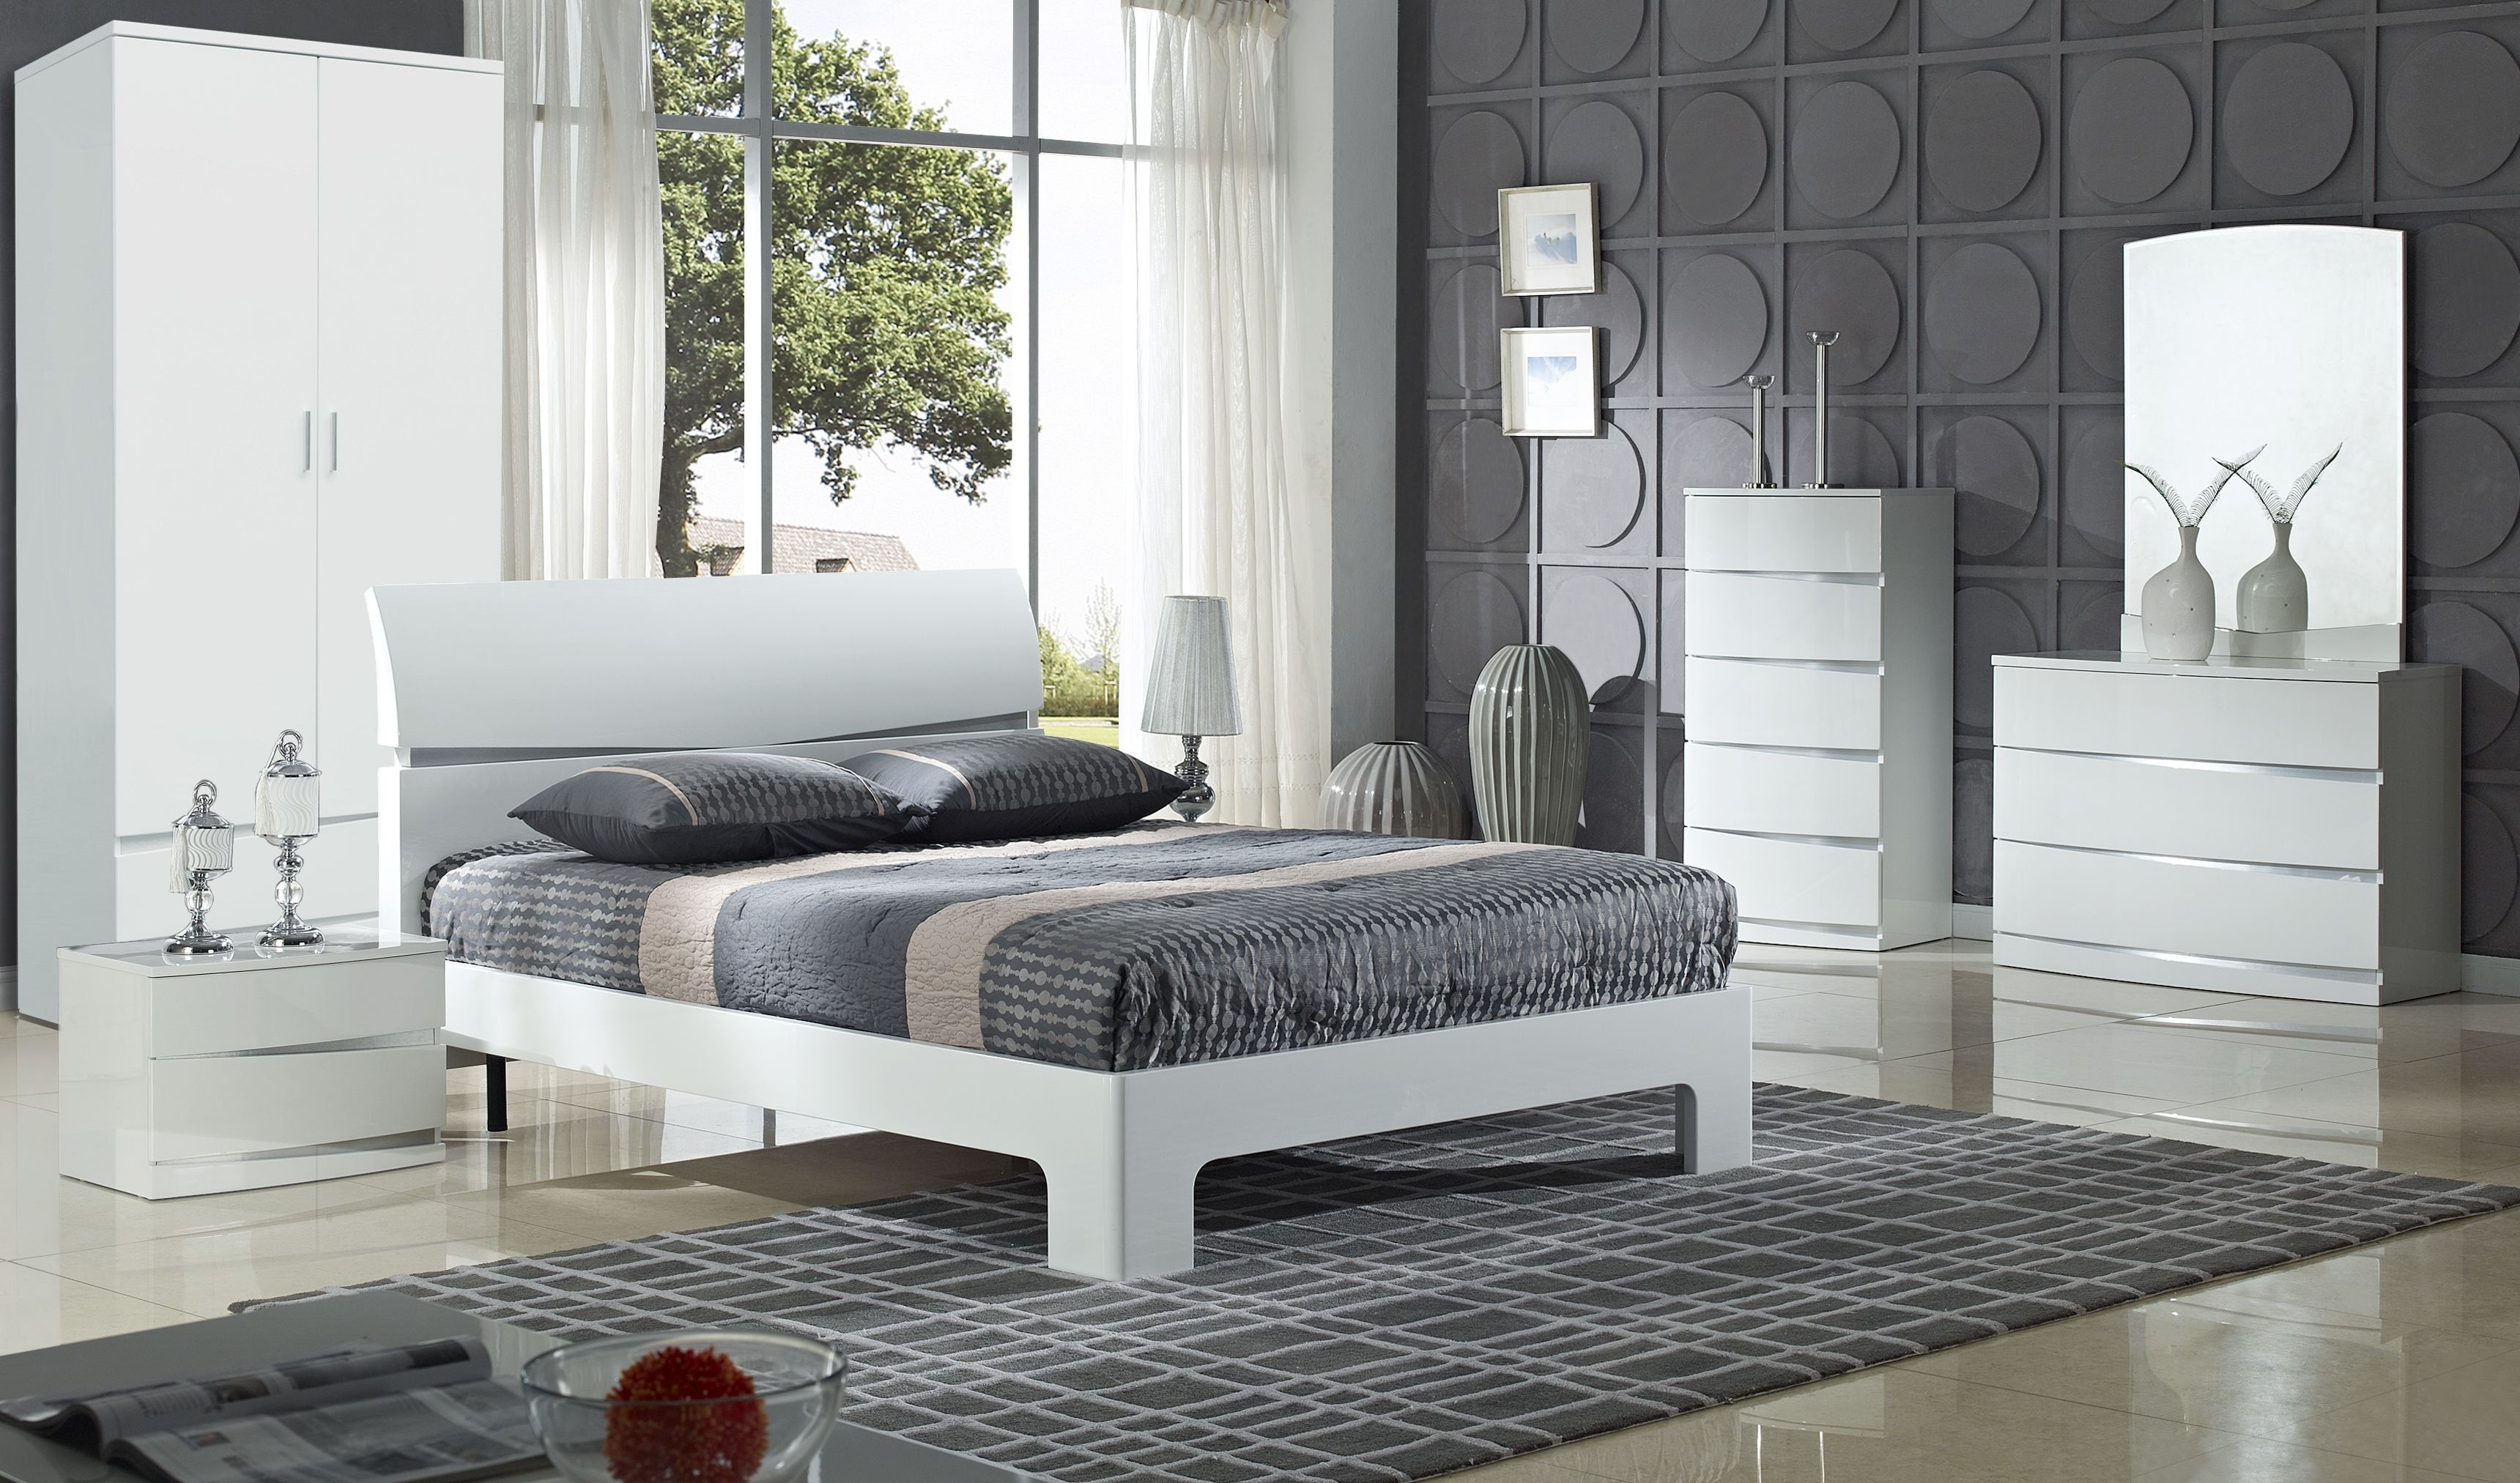 Bari High Gloss White Bedroom Furniture  White gloss bedroom